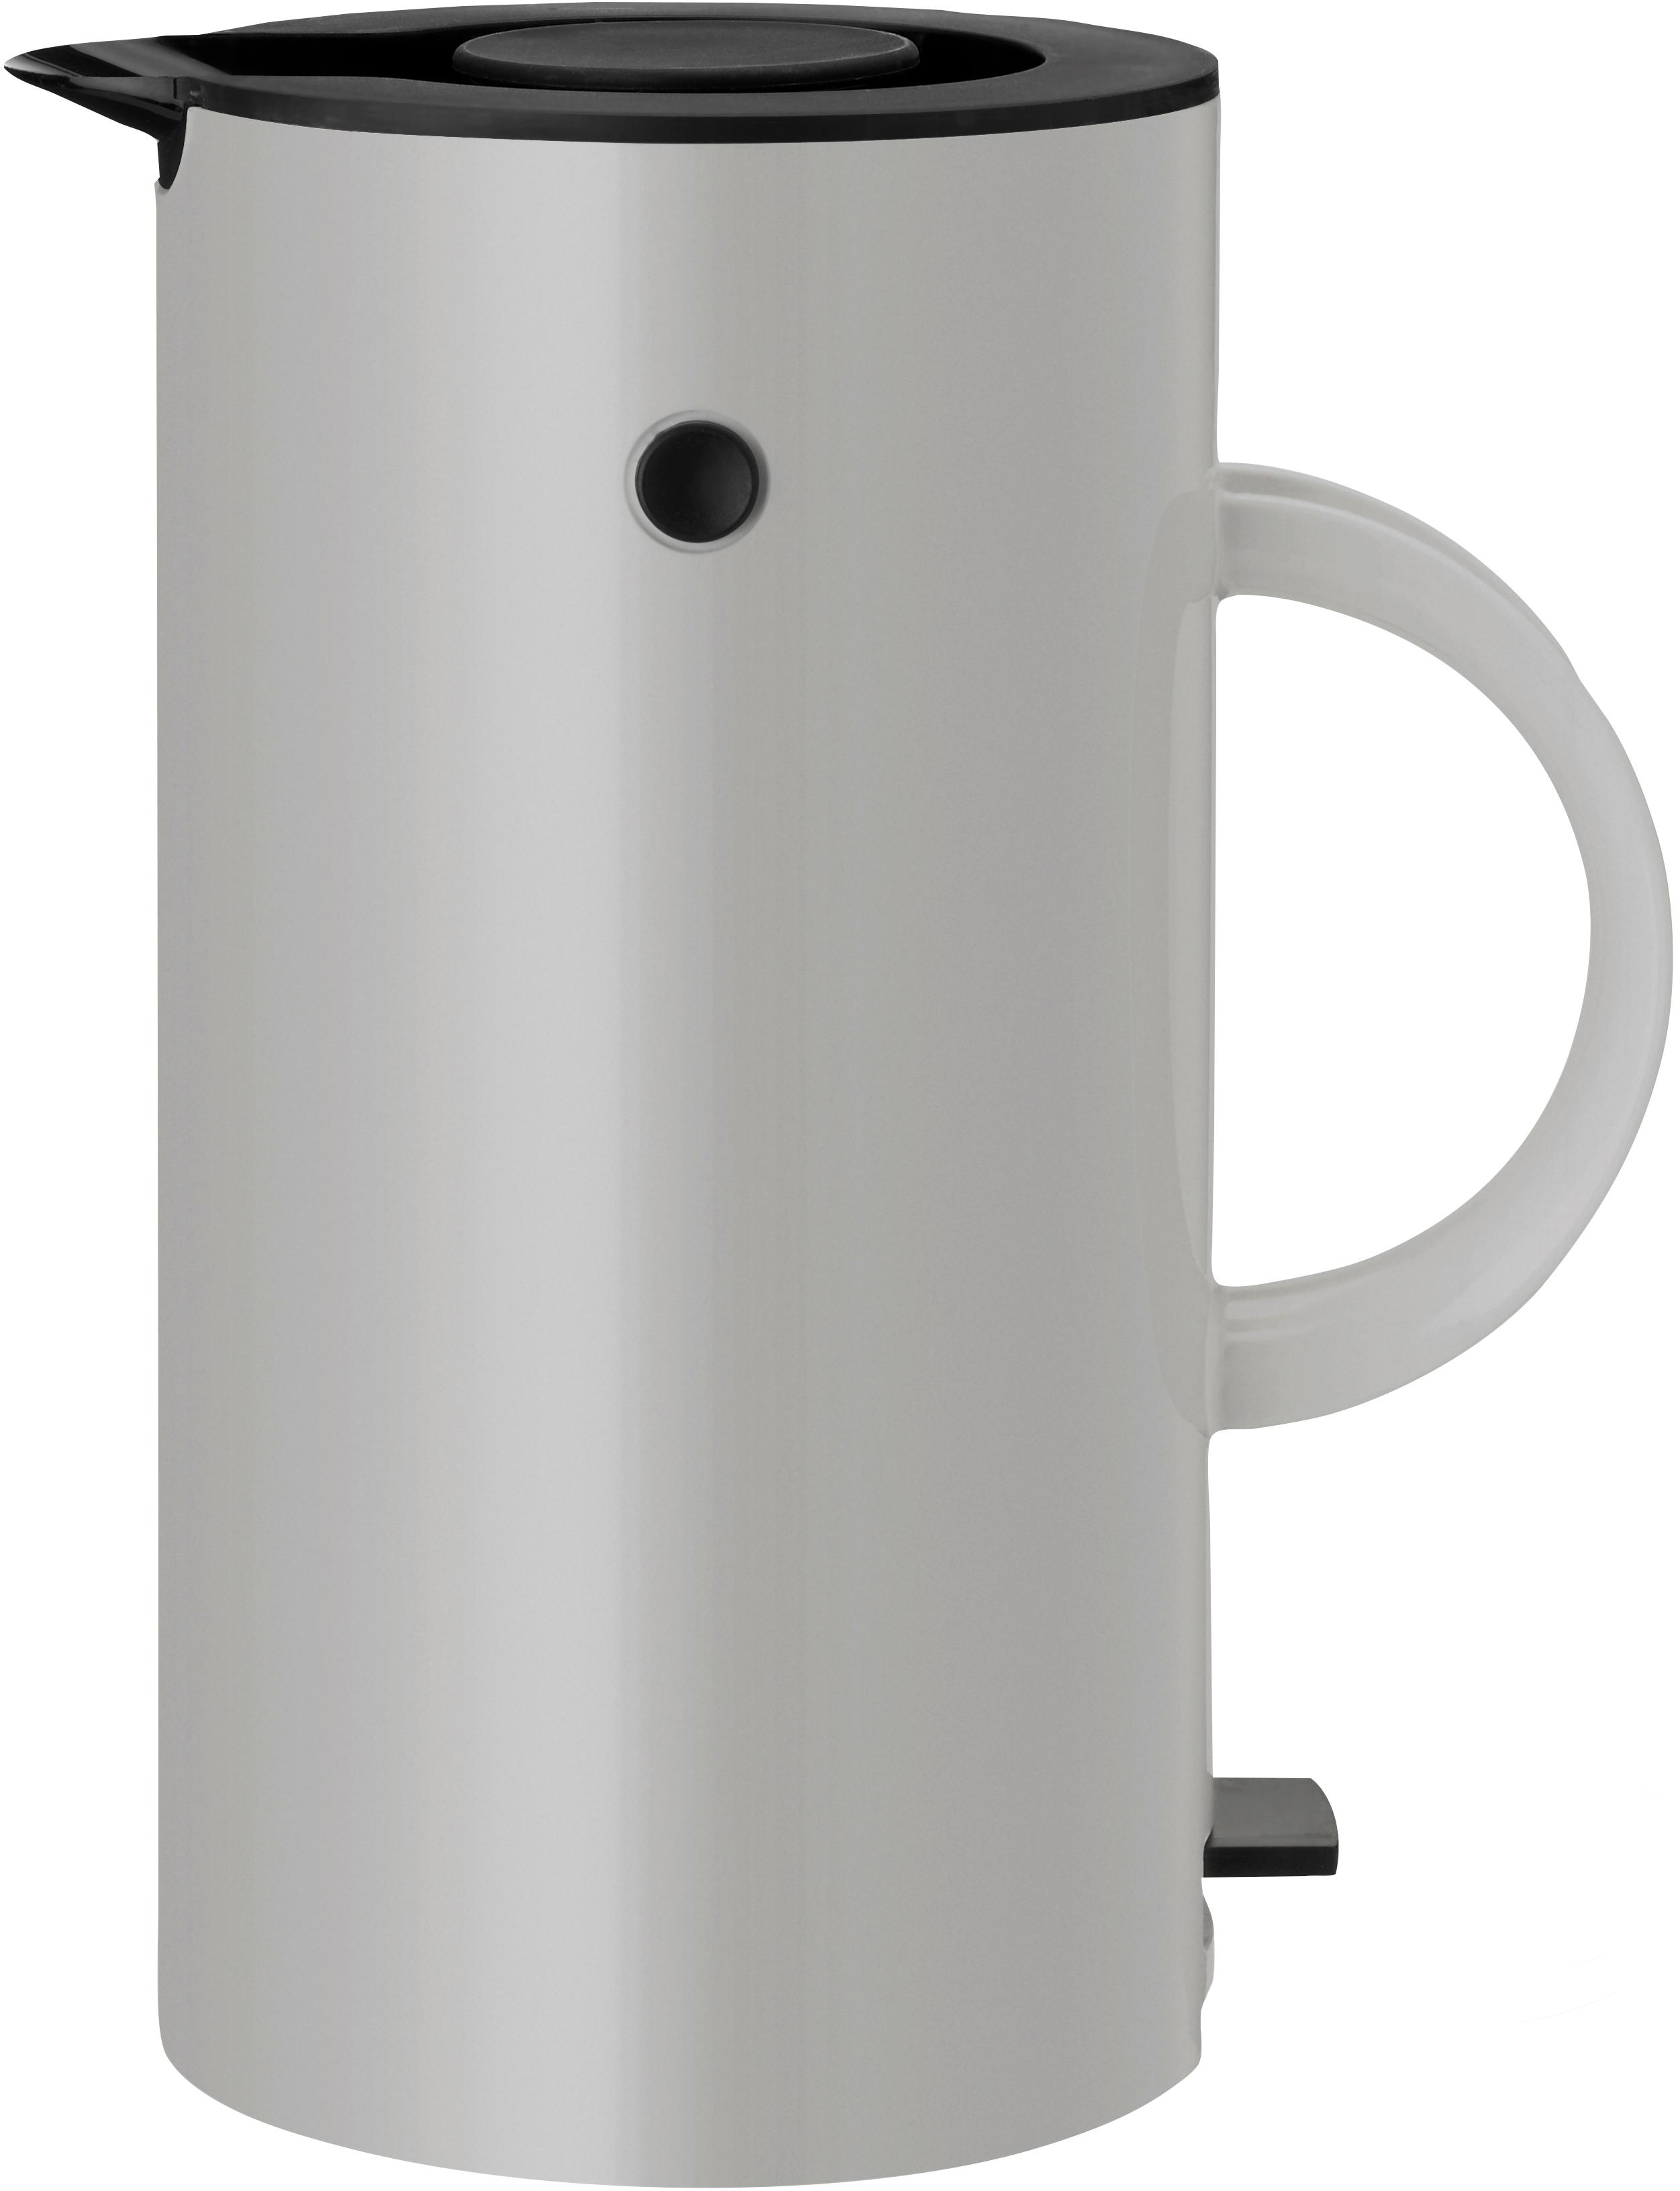 Hervidor EM77, Estructura: metal, recubierto, Gris claro, negro, 1,5 L